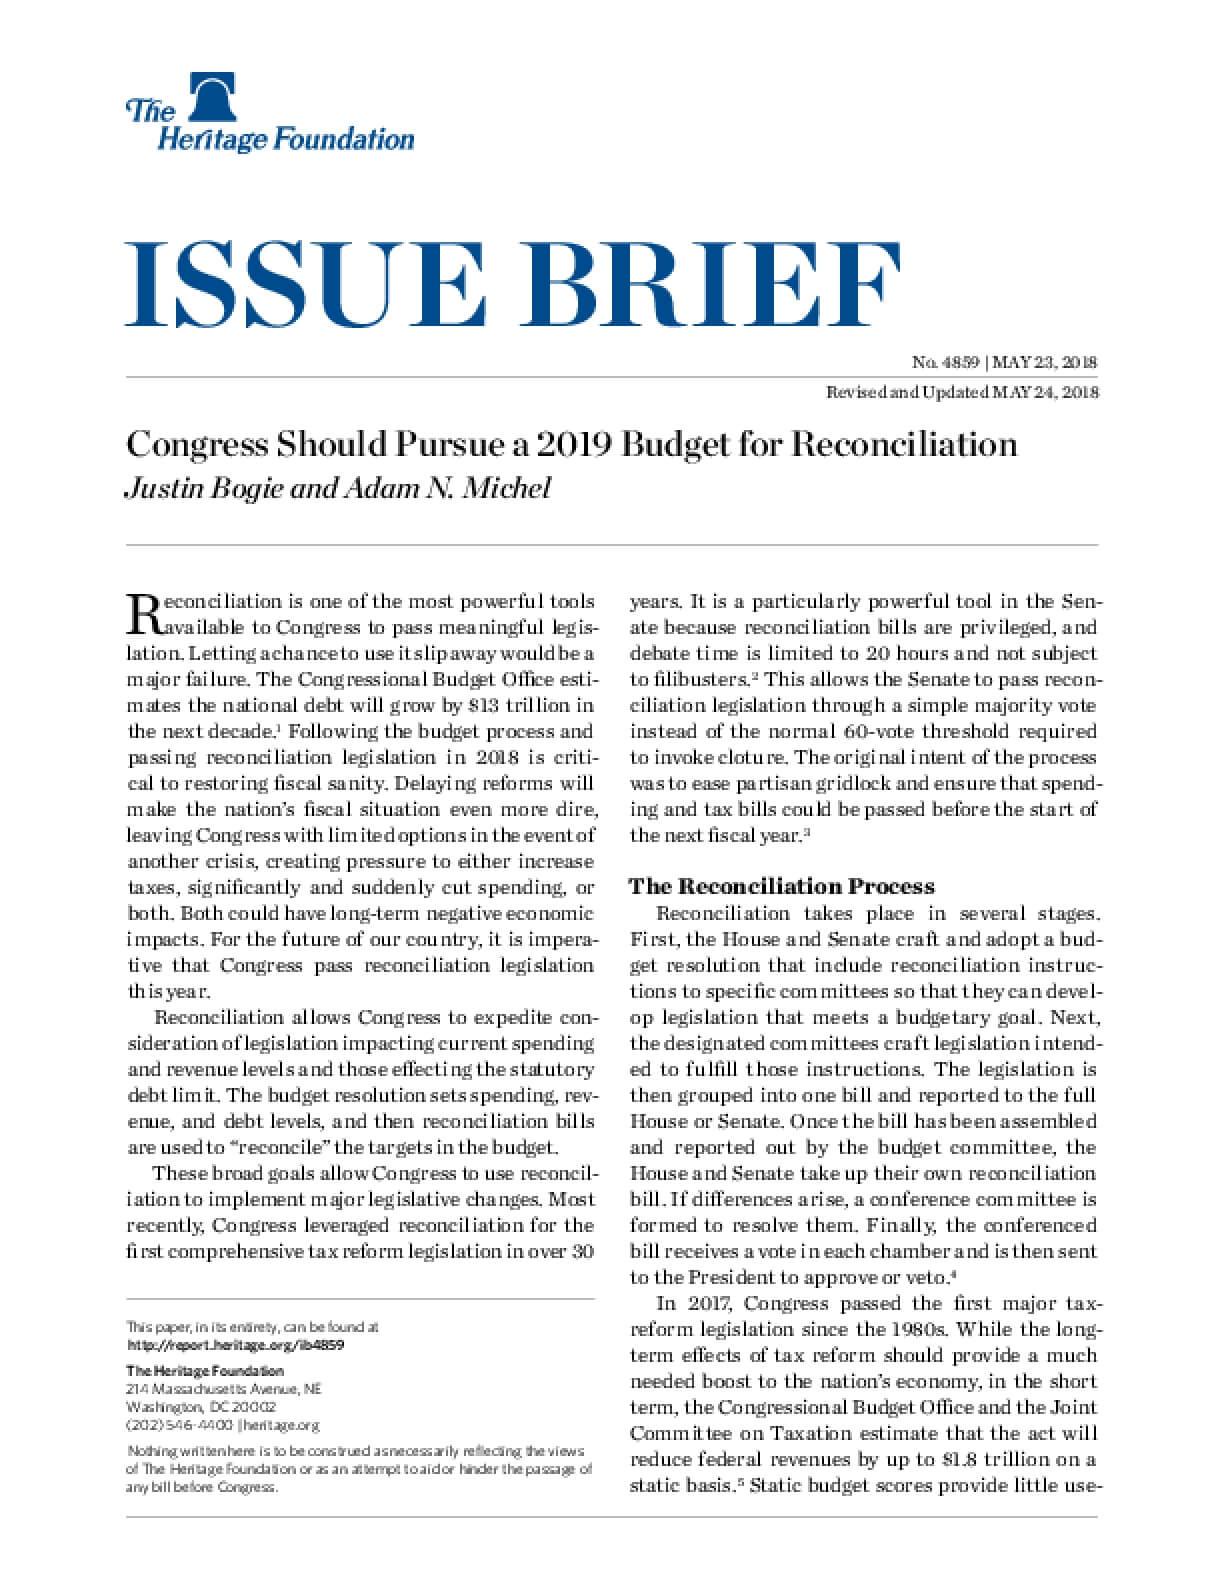 Congress Should Pursue a 2019 Budget for Reconciliation